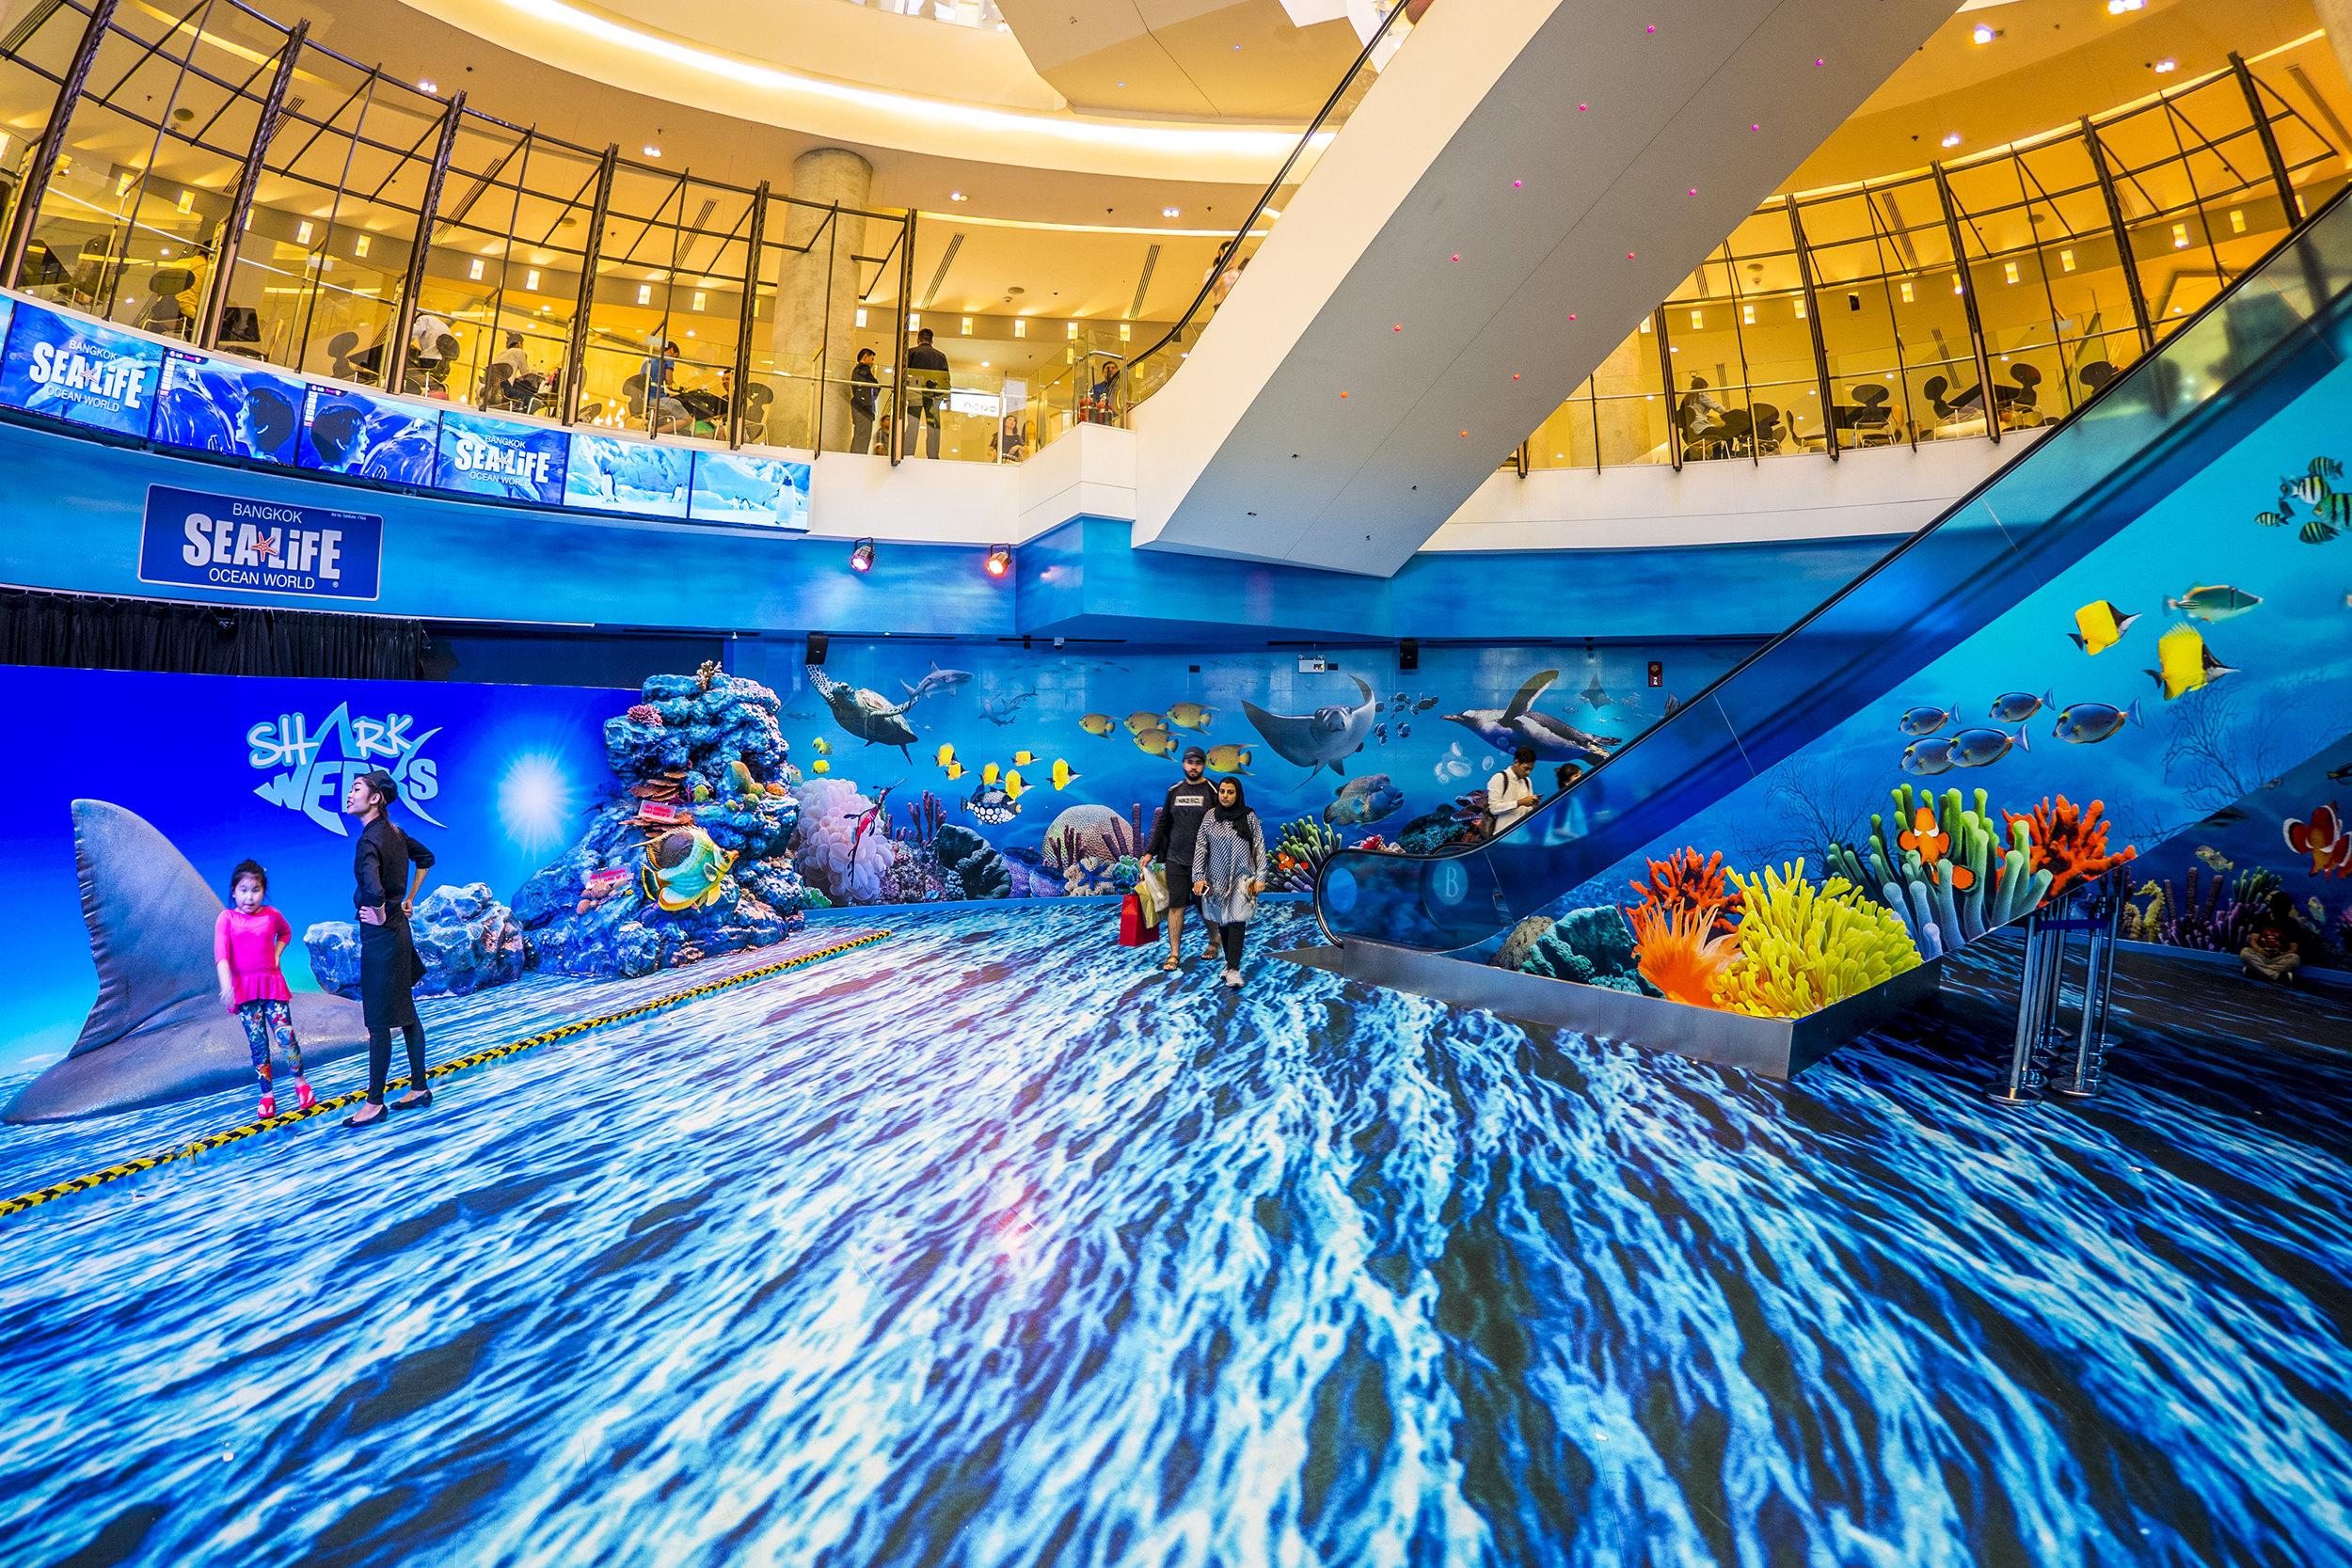 曼谷暹羅海洋世界  Sea Life Bangkok Ocean World   -4